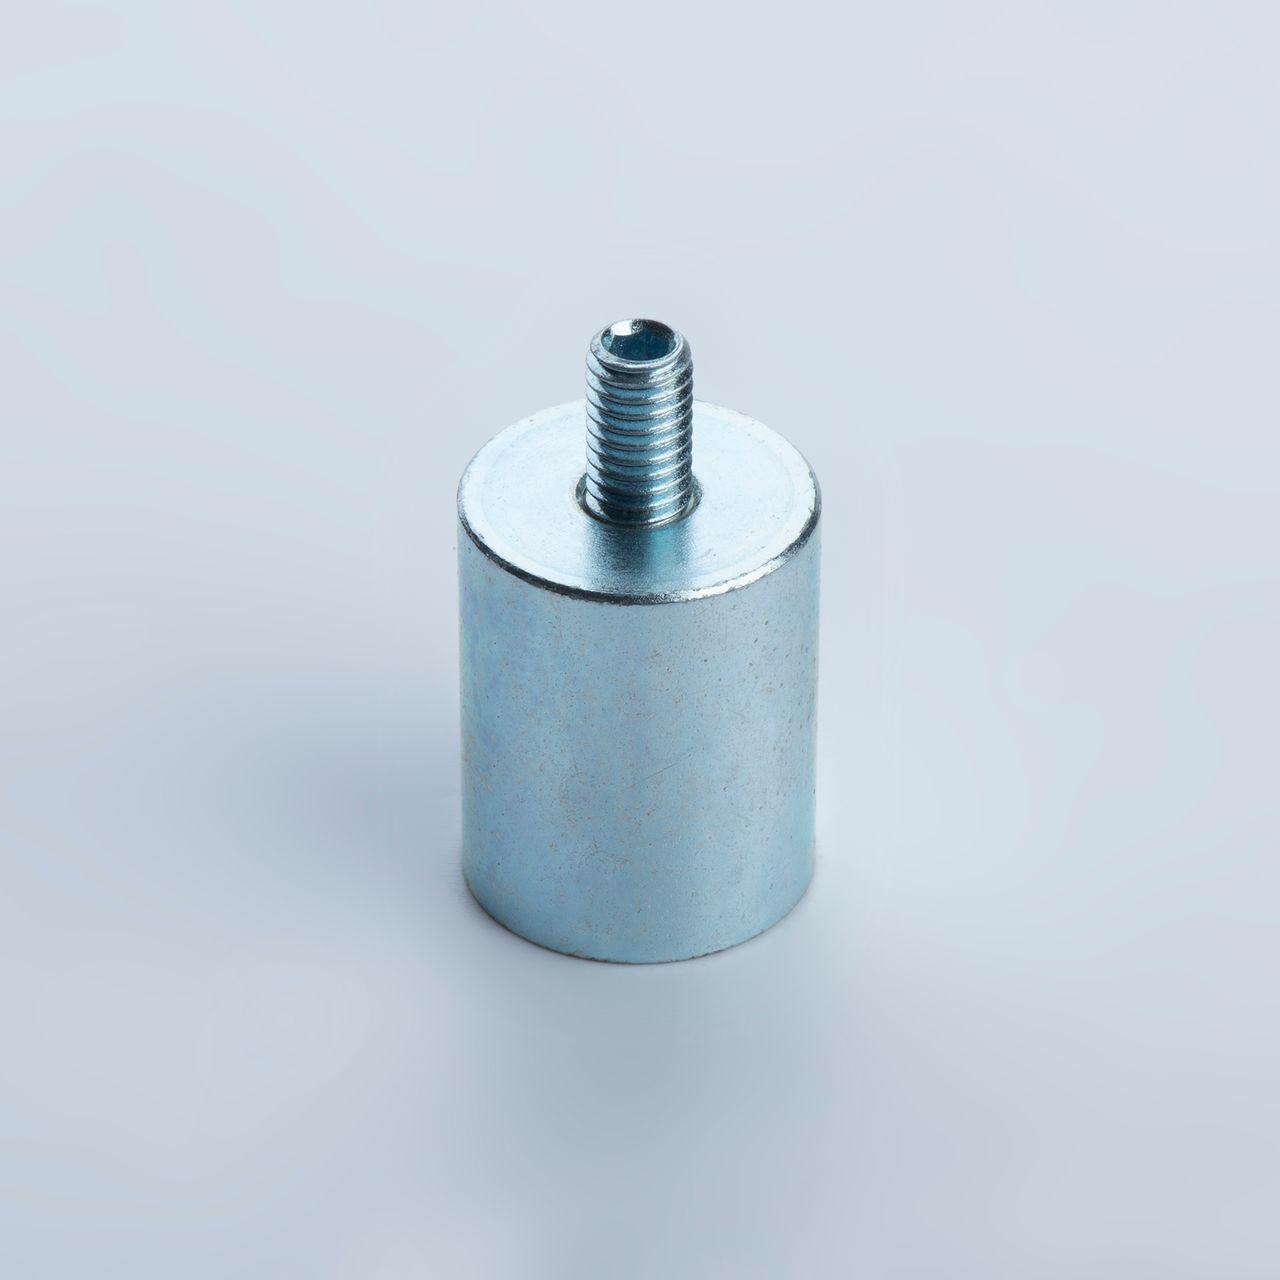 Bar holding magnet made of NdFeB, steel housing with external thread, galvanized, thyssenkrupp Magnettechnik